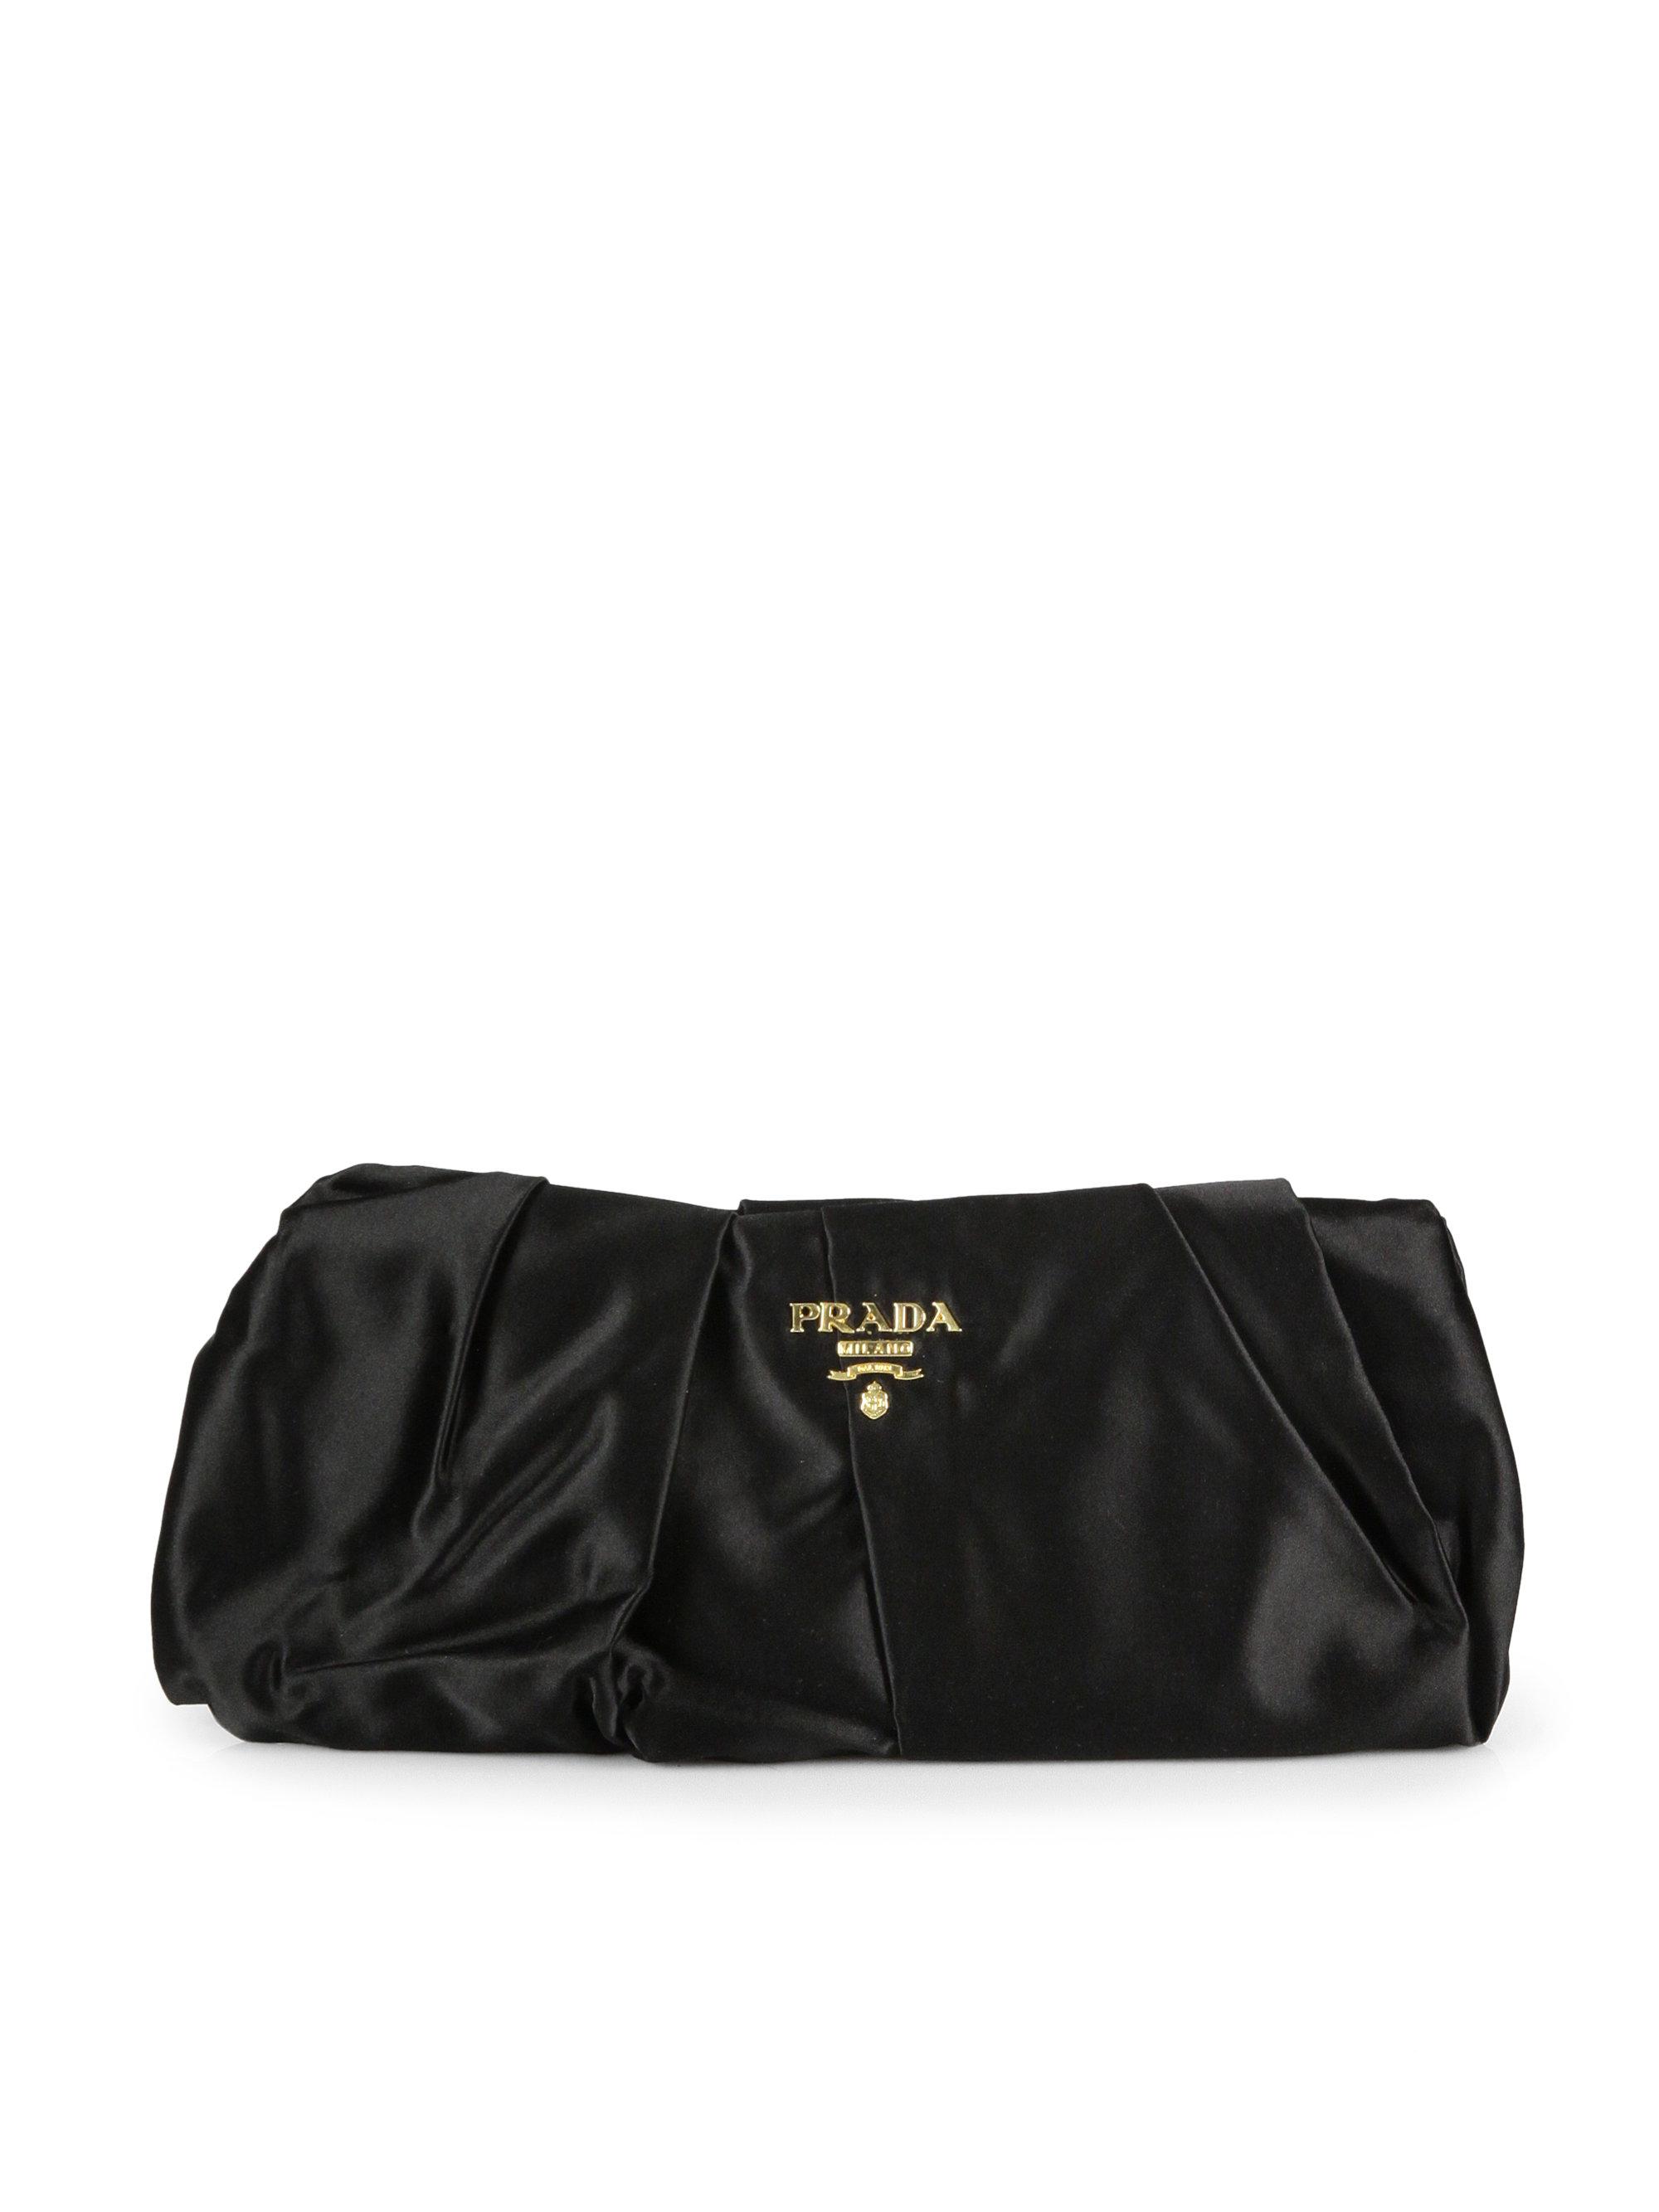 c5868c1c4d3e Prada Pleated Satin Clutch in Black (nero-black) | Lyst. sale prada diamond pleated  nylon tessuto ...